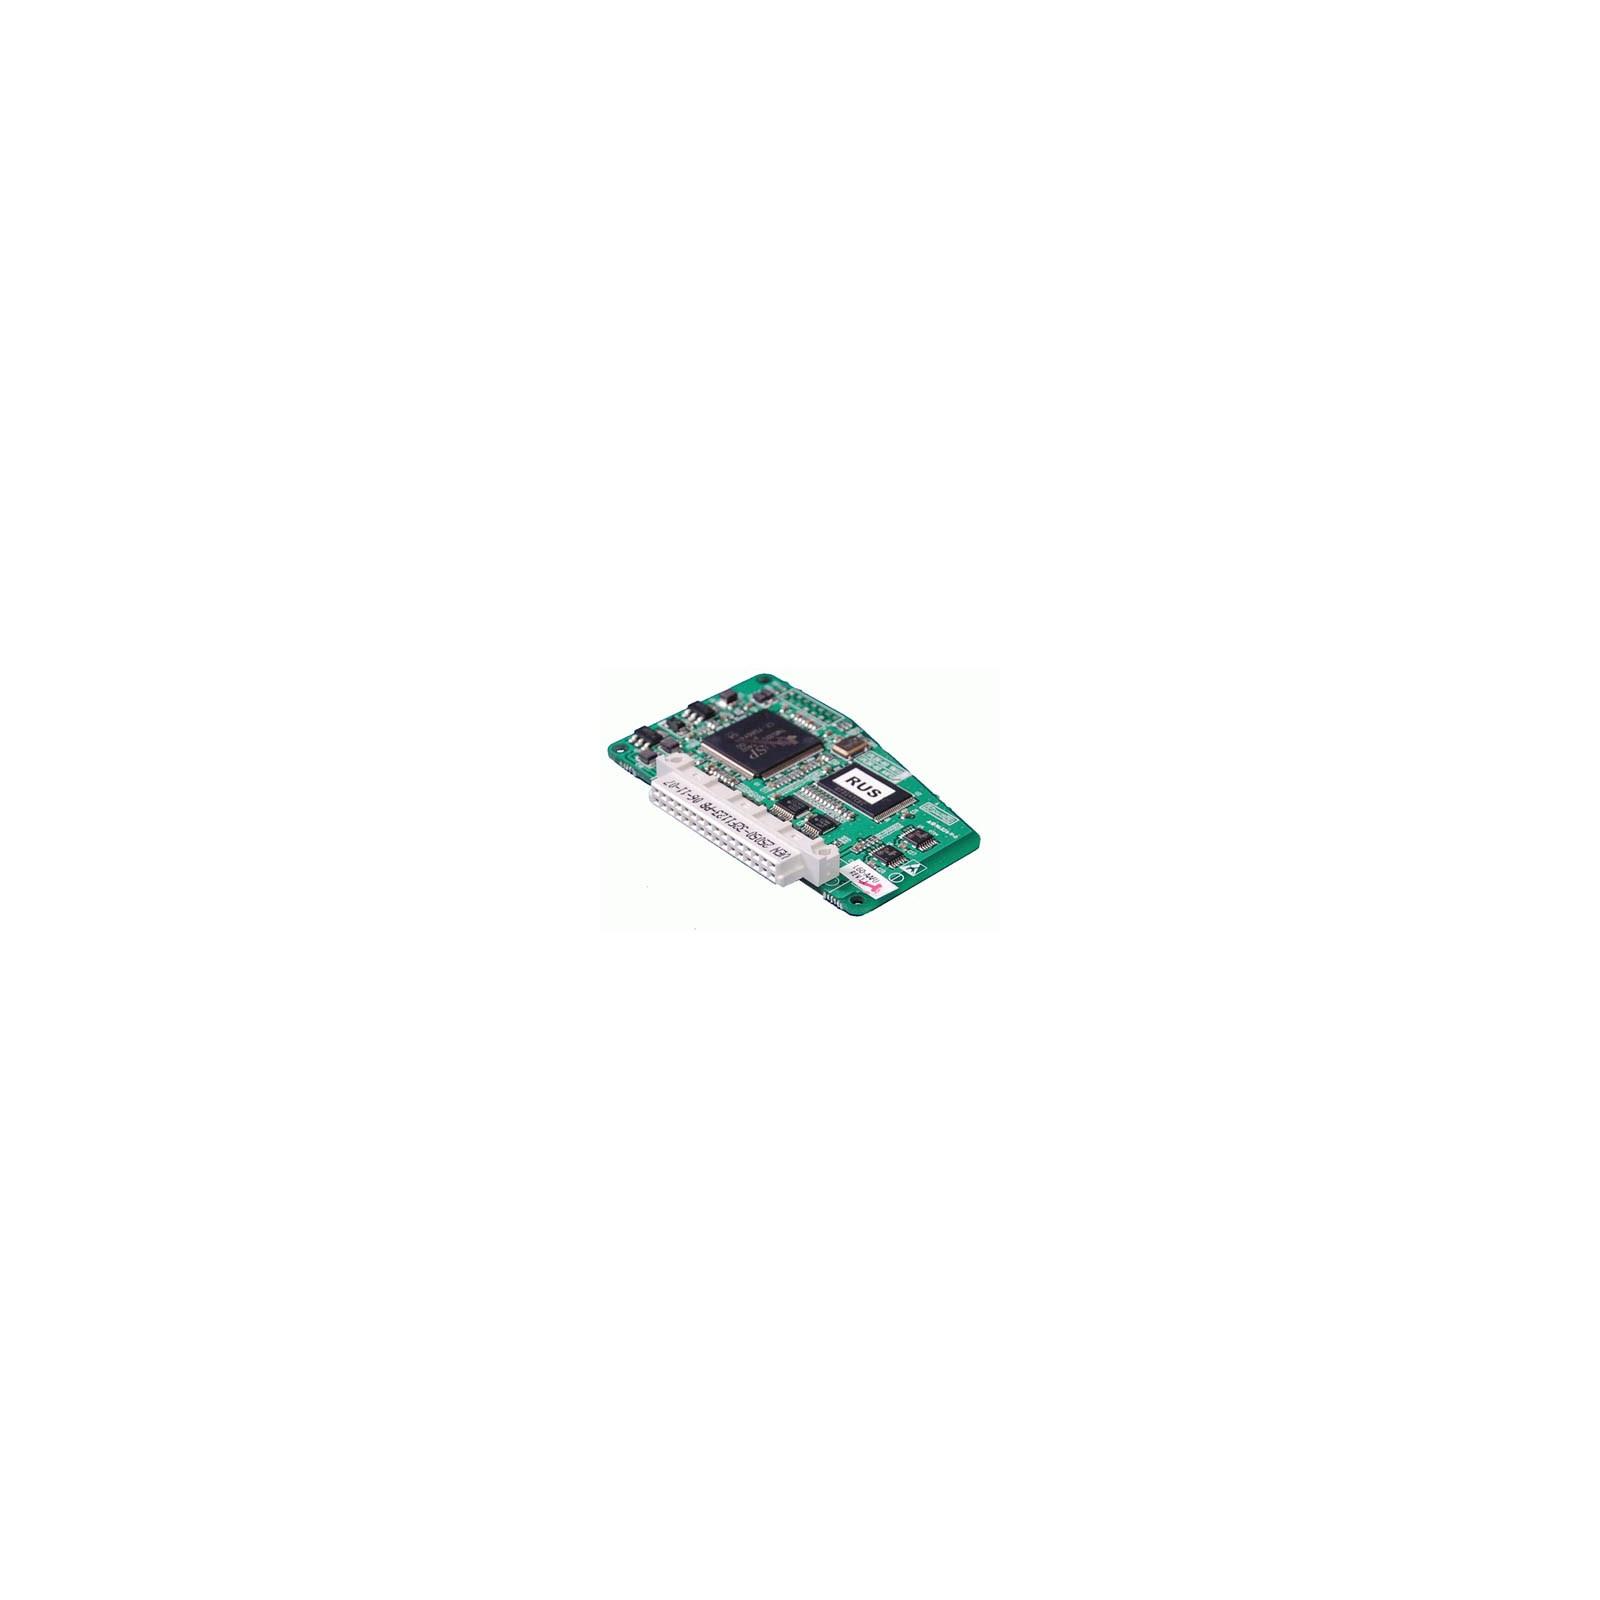 Оборудование для АТС LG L60-AAFU